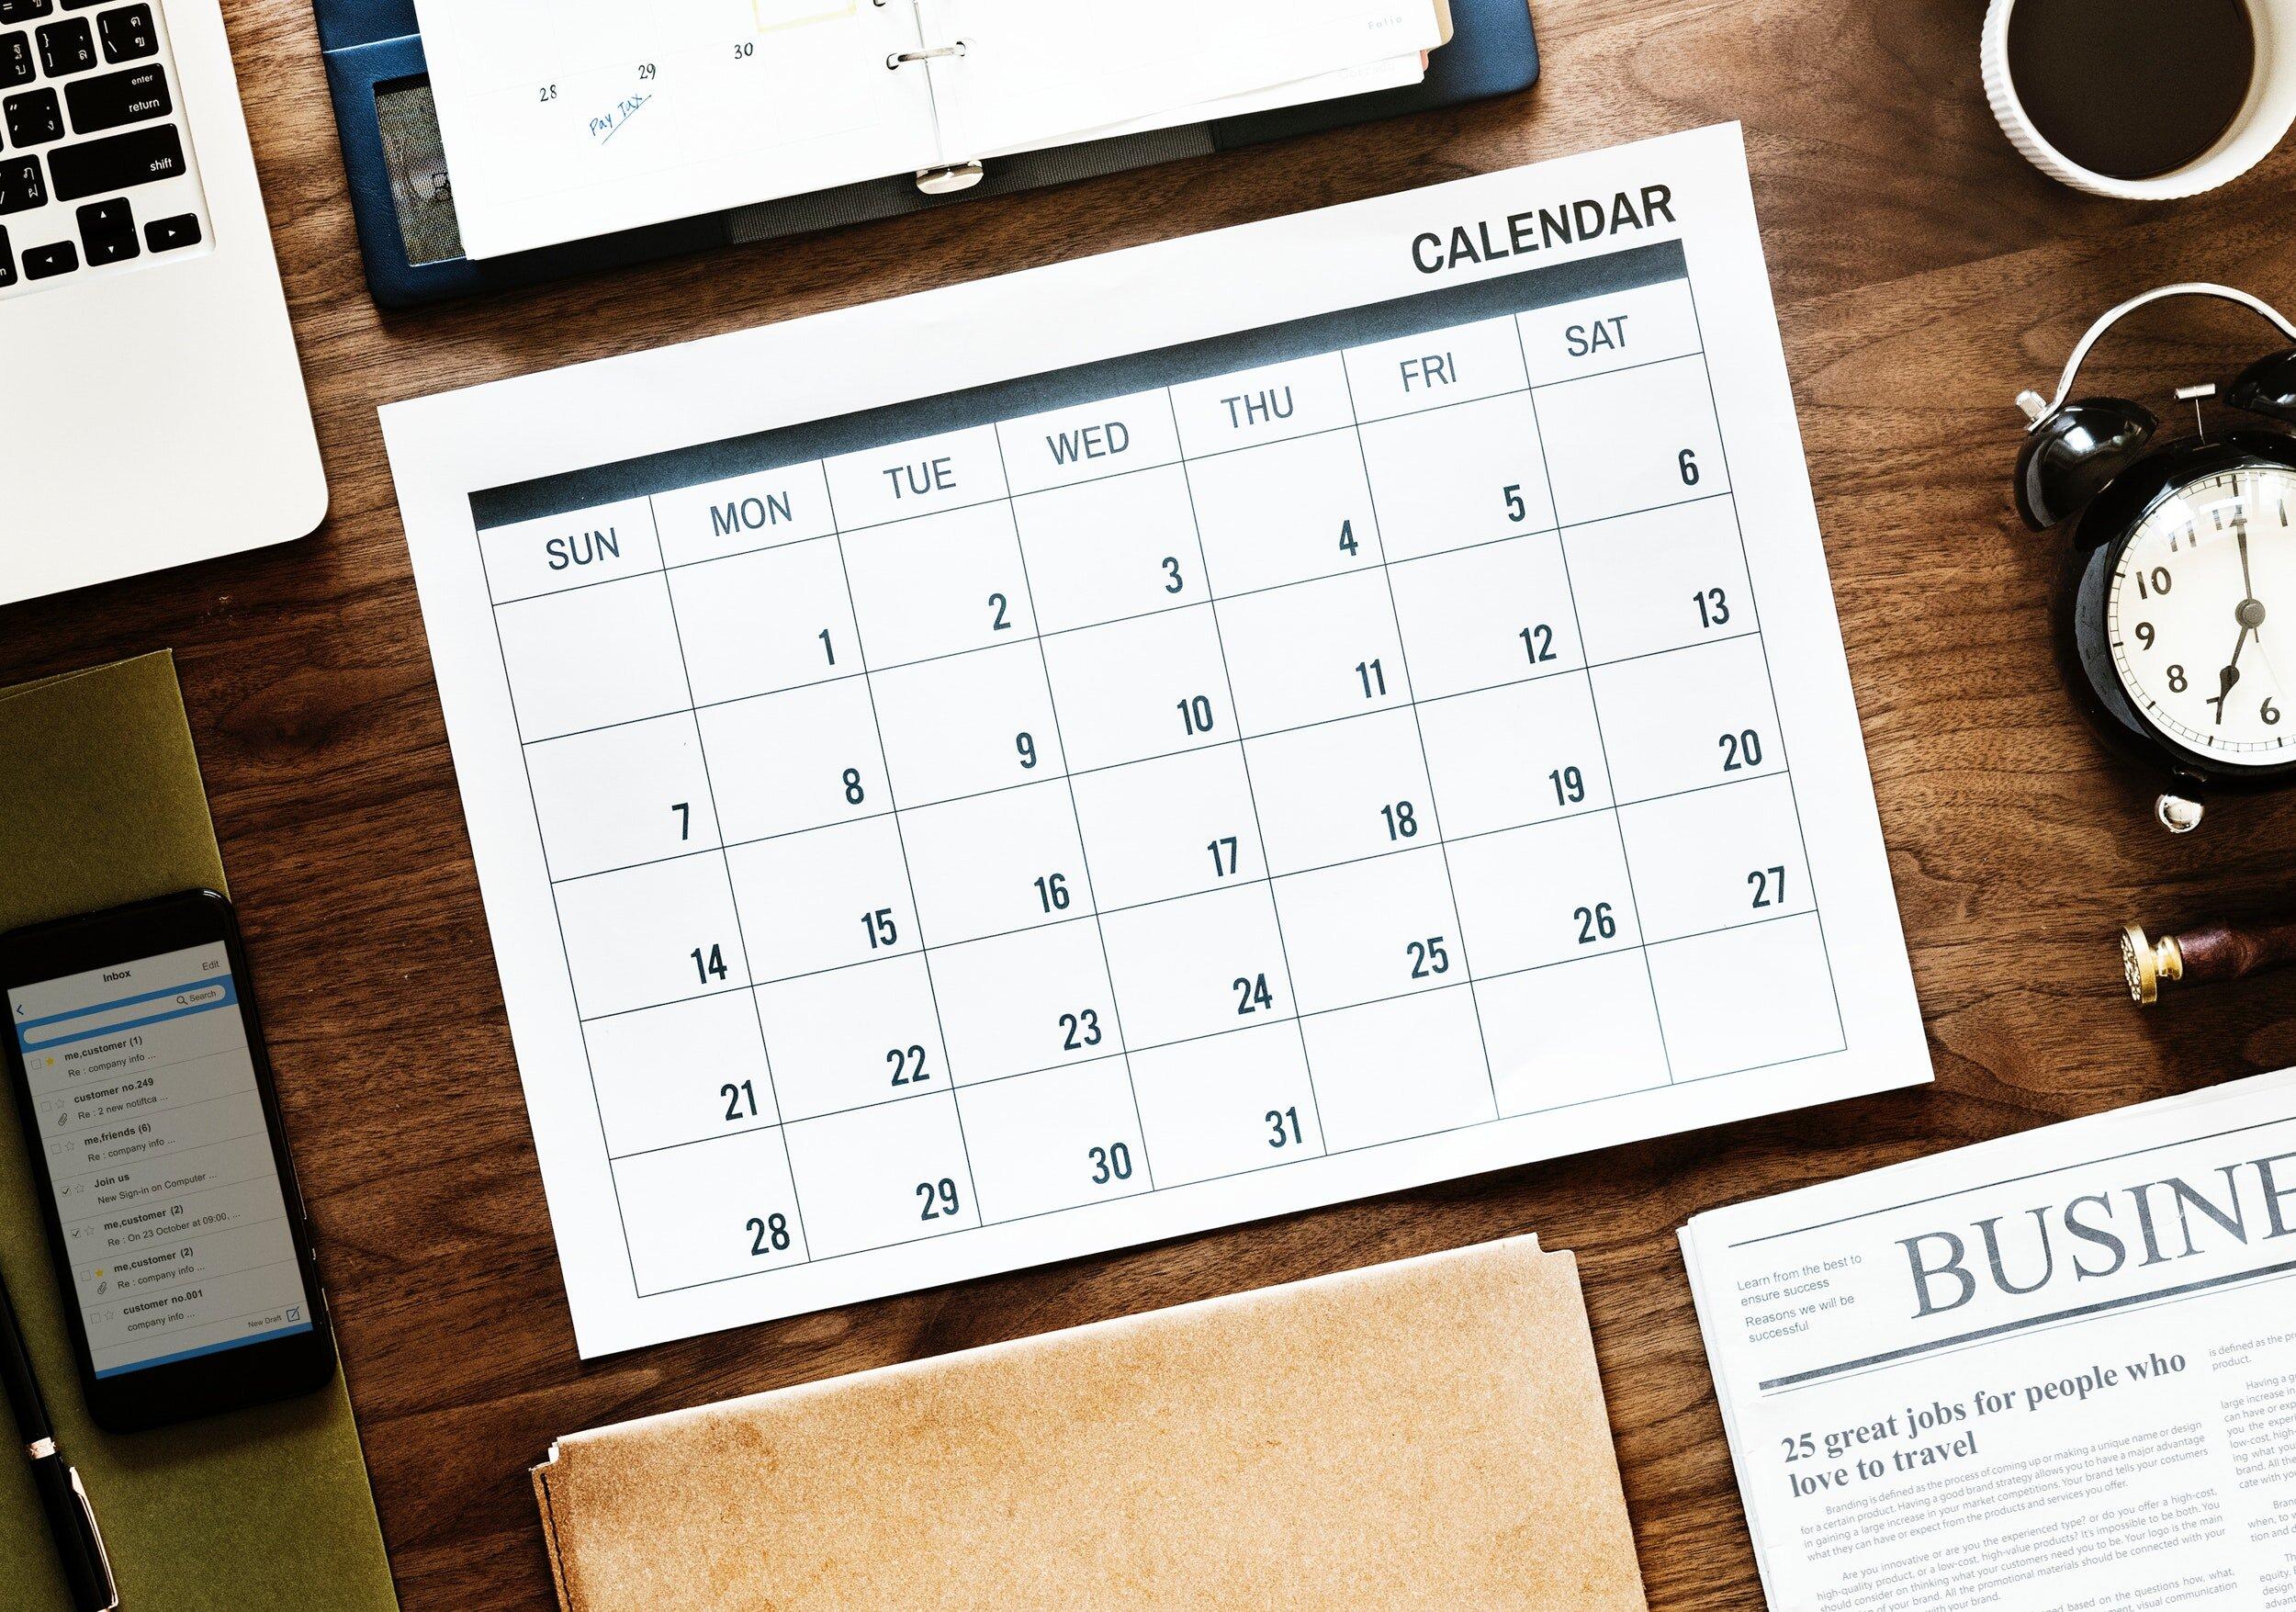 agenda-calendar-data-1020323 (1).jpg